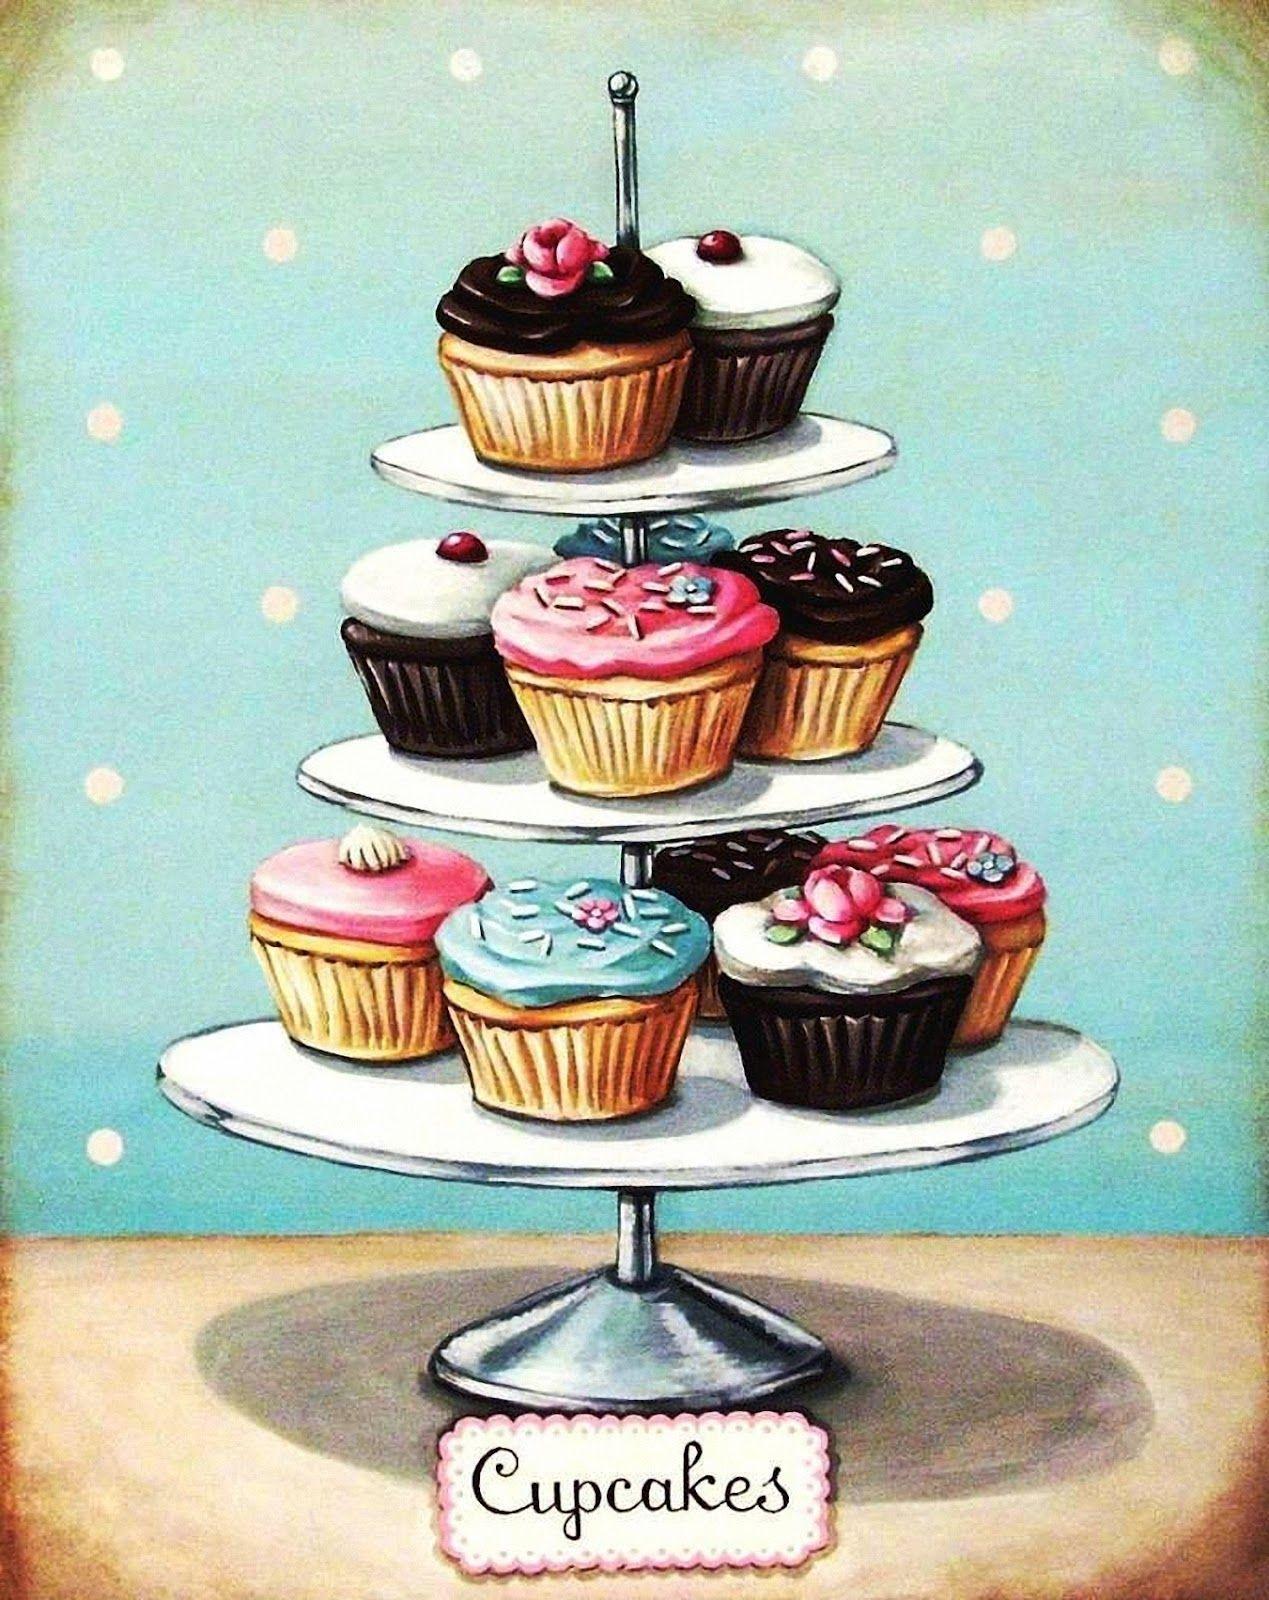 cupcakes | Decoupage Kitchen | Pinterest | Decoupage, Illustrations ...